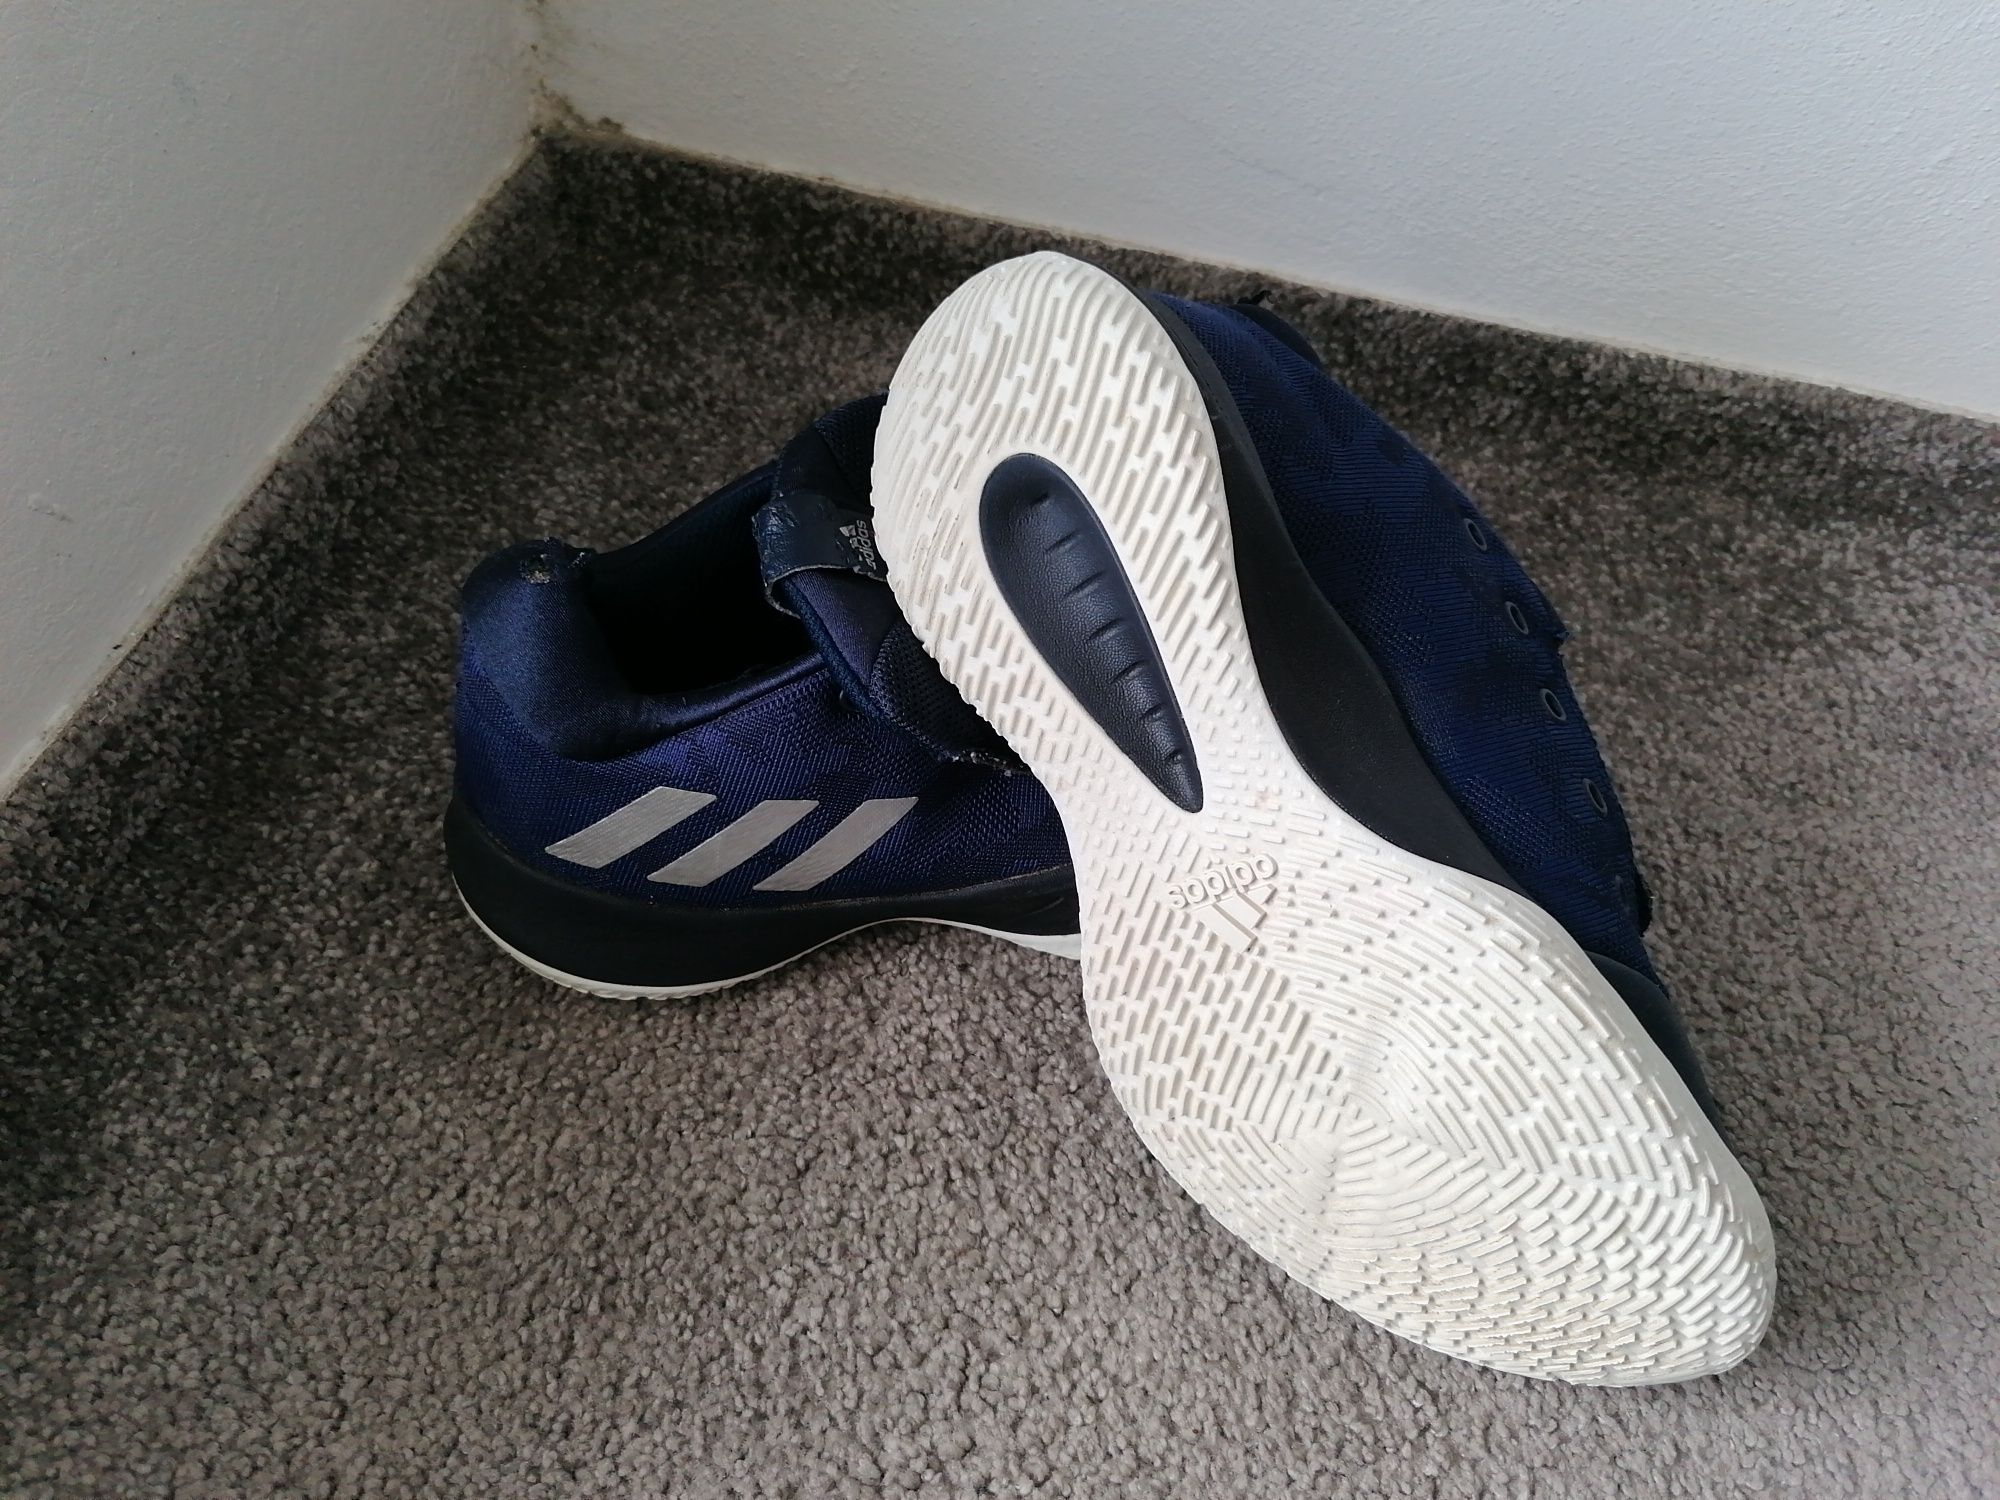 Adidași adidas 42